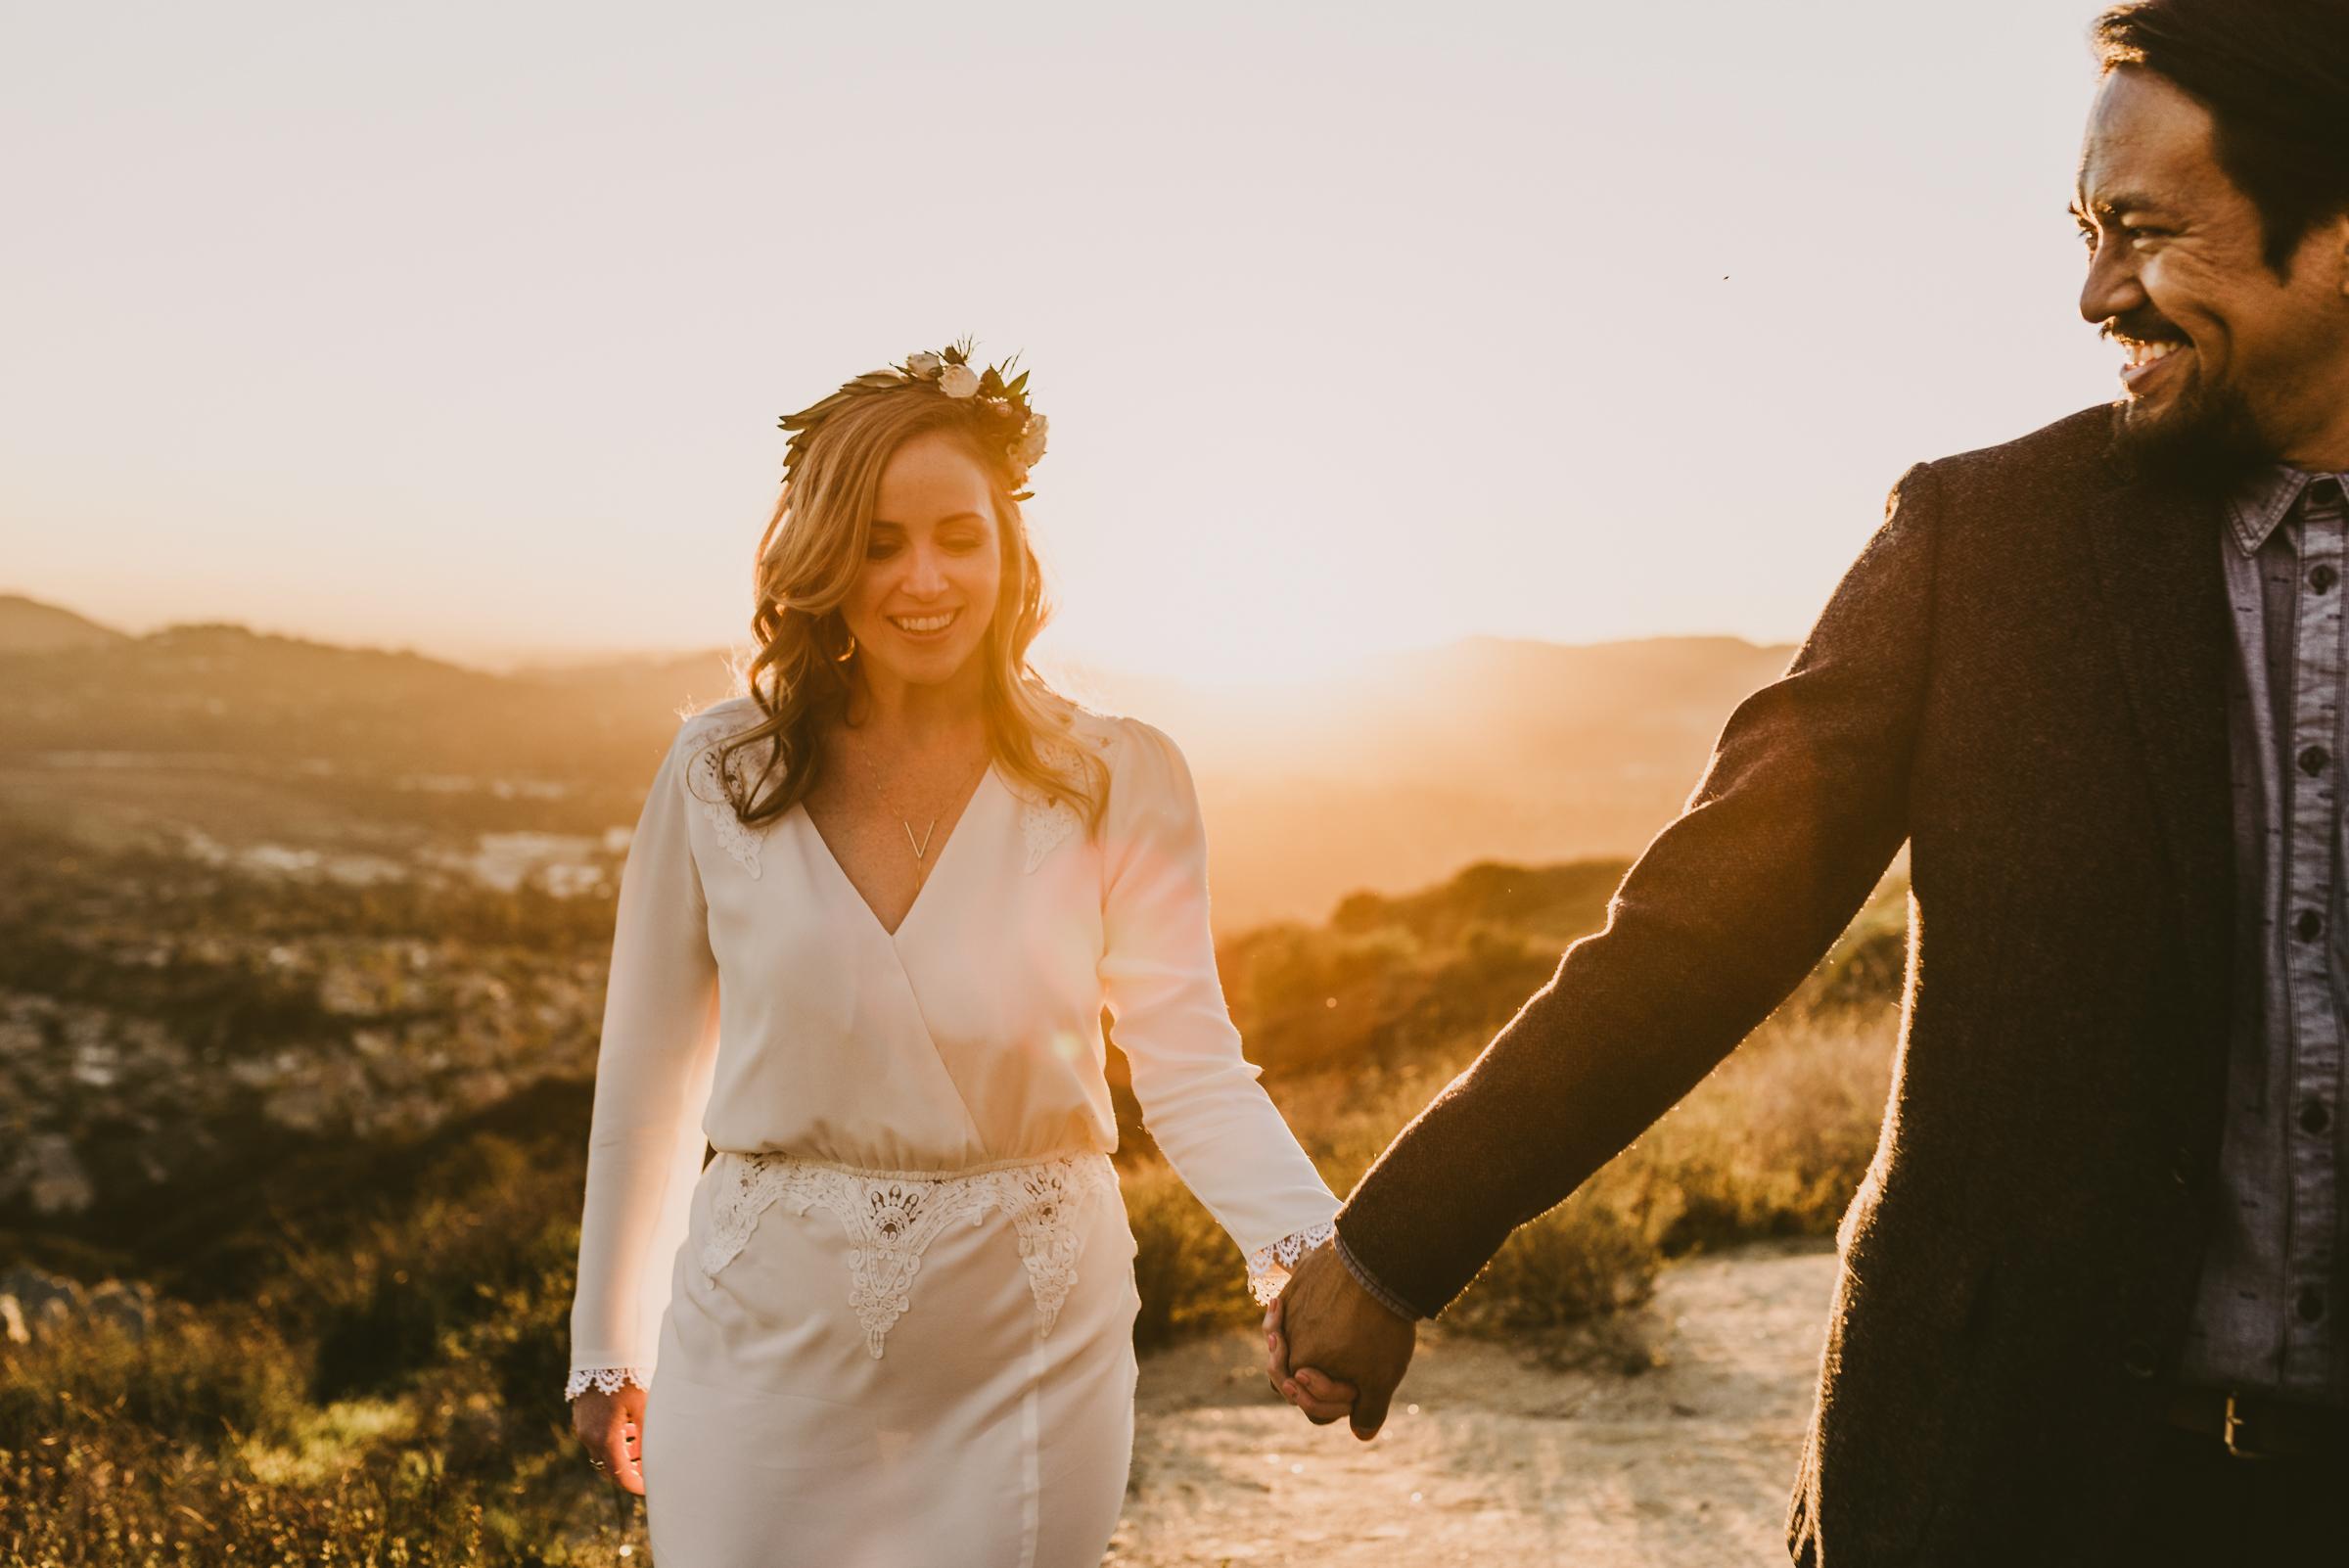 ©Isaiah + Taylor Photography - Intimate Elopement, Eaton Canyon, Los Angeles Wedding Photographer-85.jpg